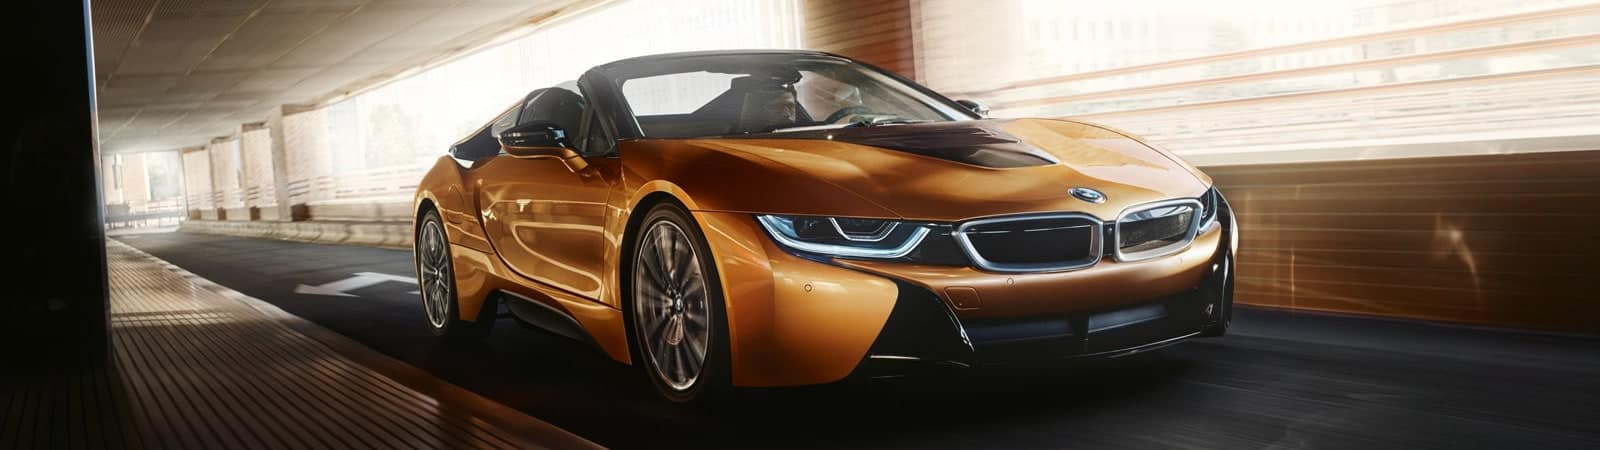 A 2020 BMW i8 Driving on a bridge